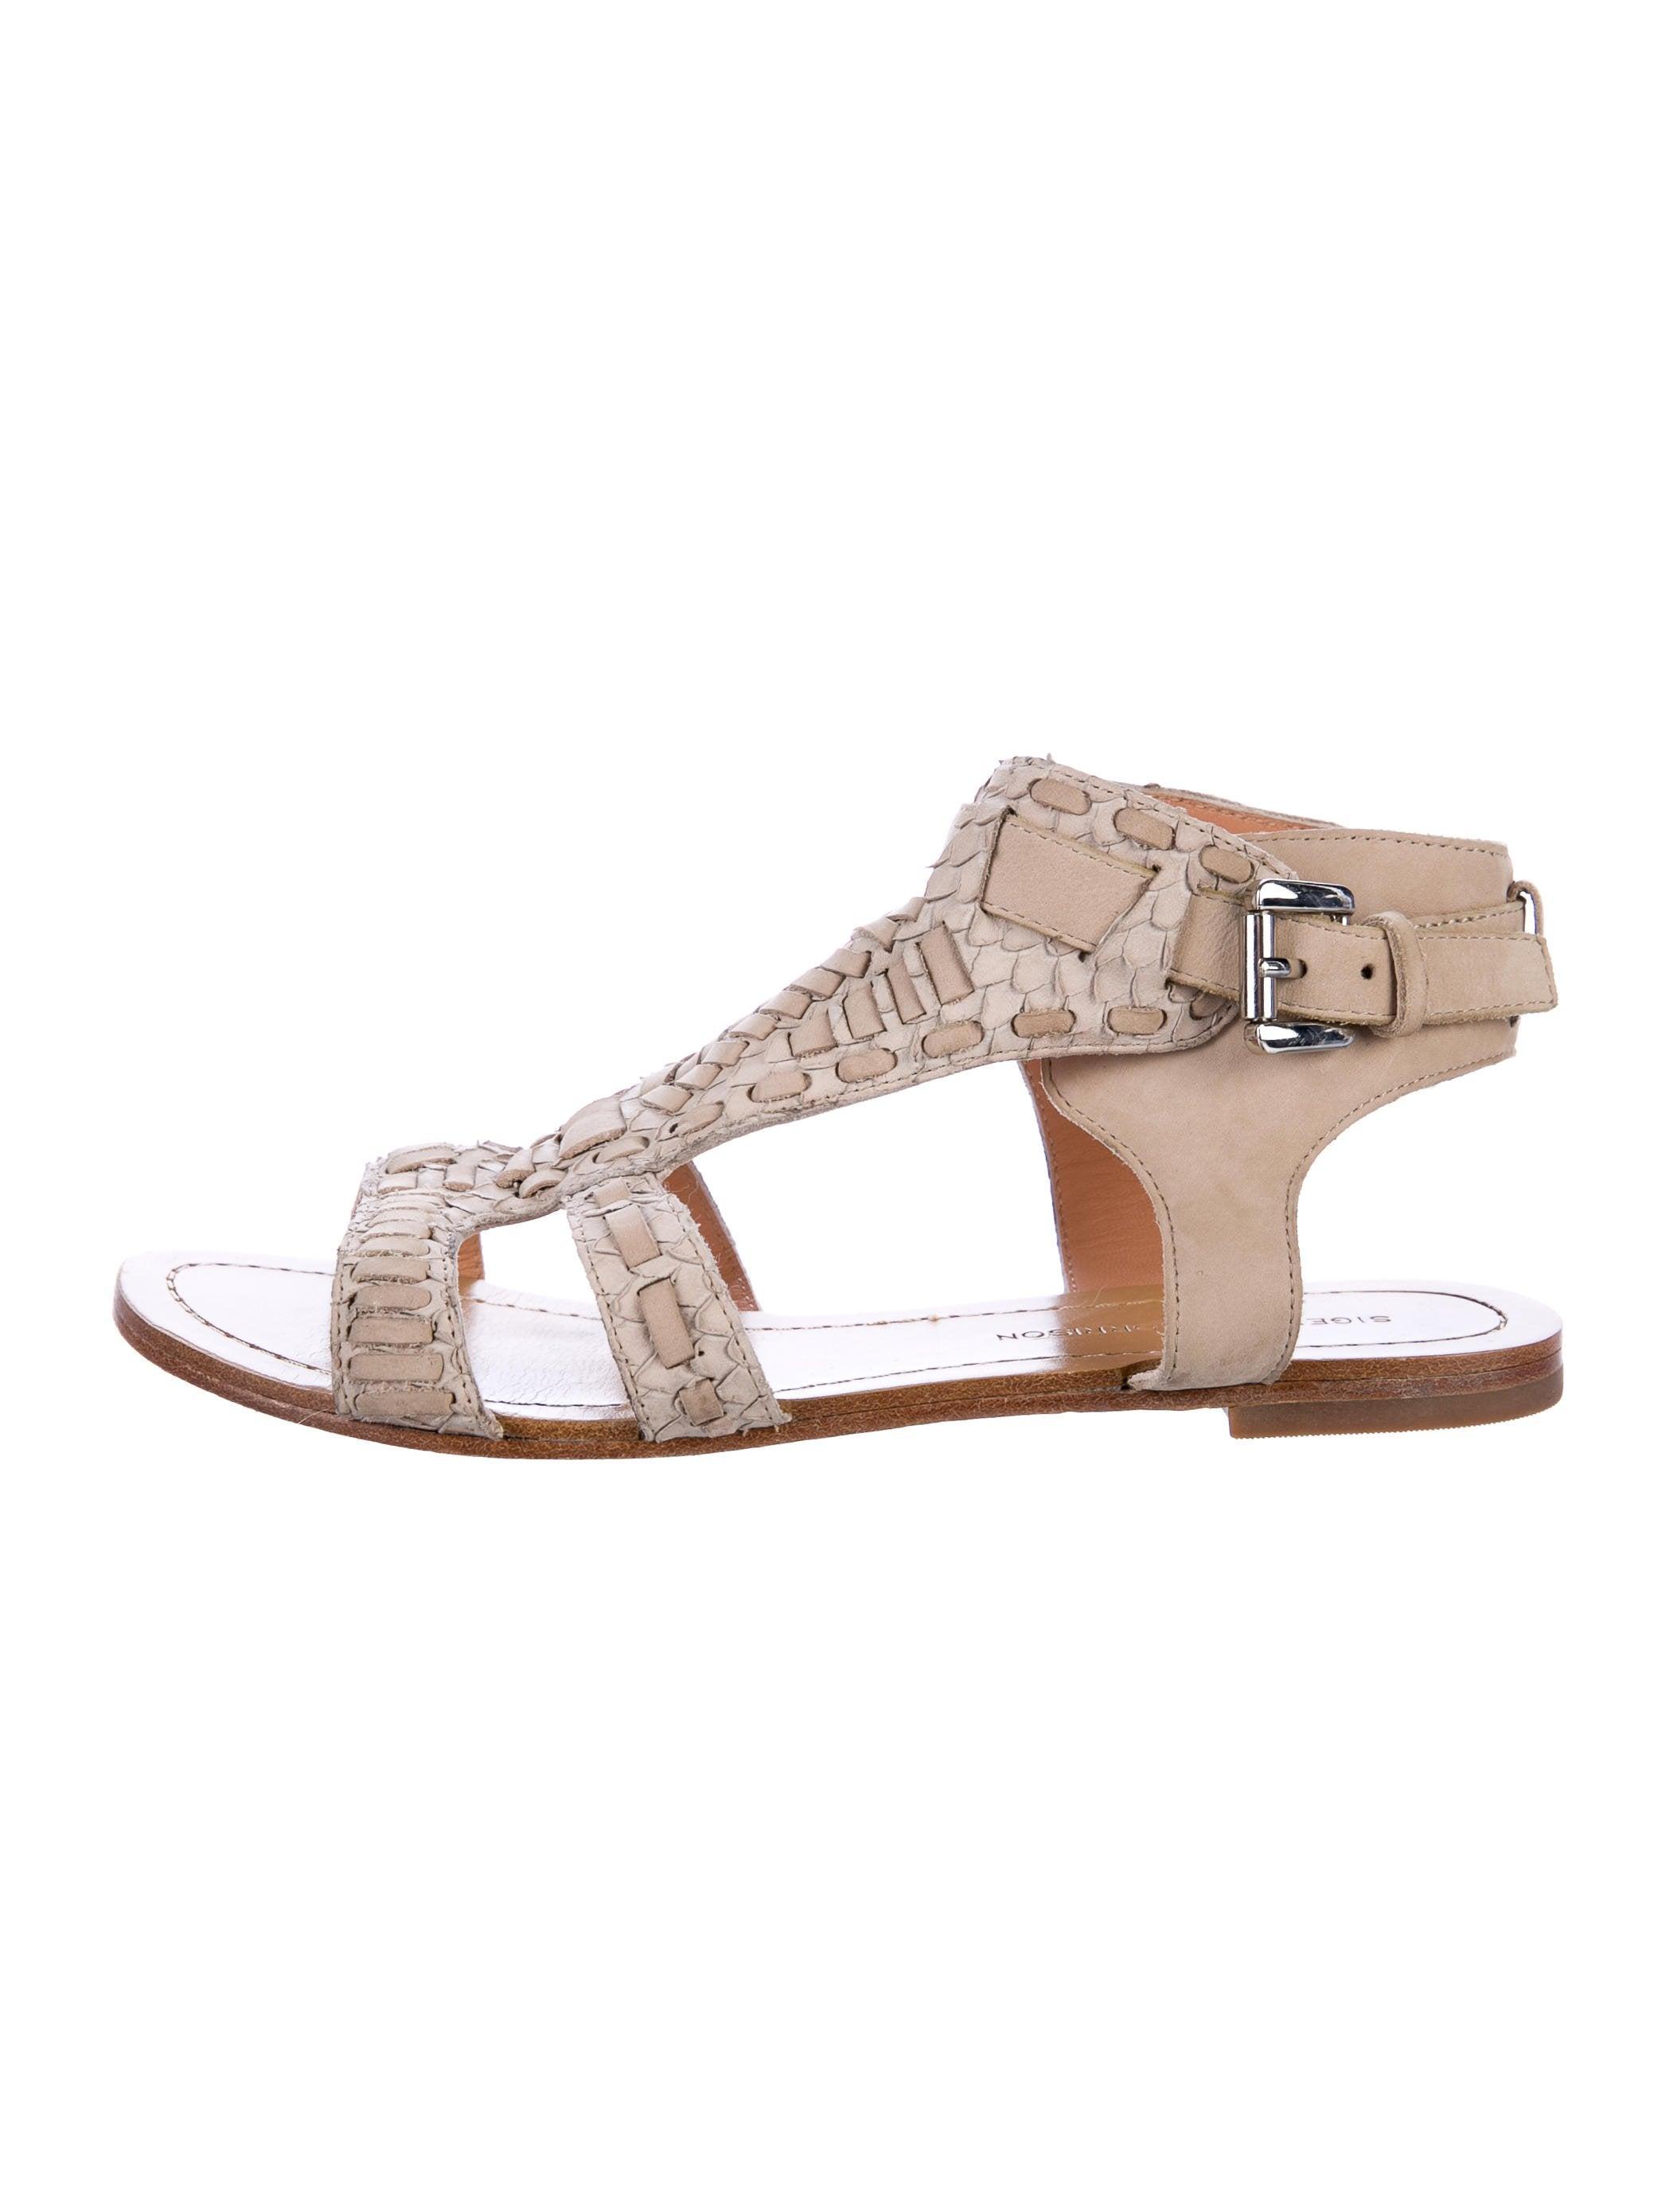 Sigerson Morrison Embossed Gladiator Sandals free shipping big discount PslDkJw